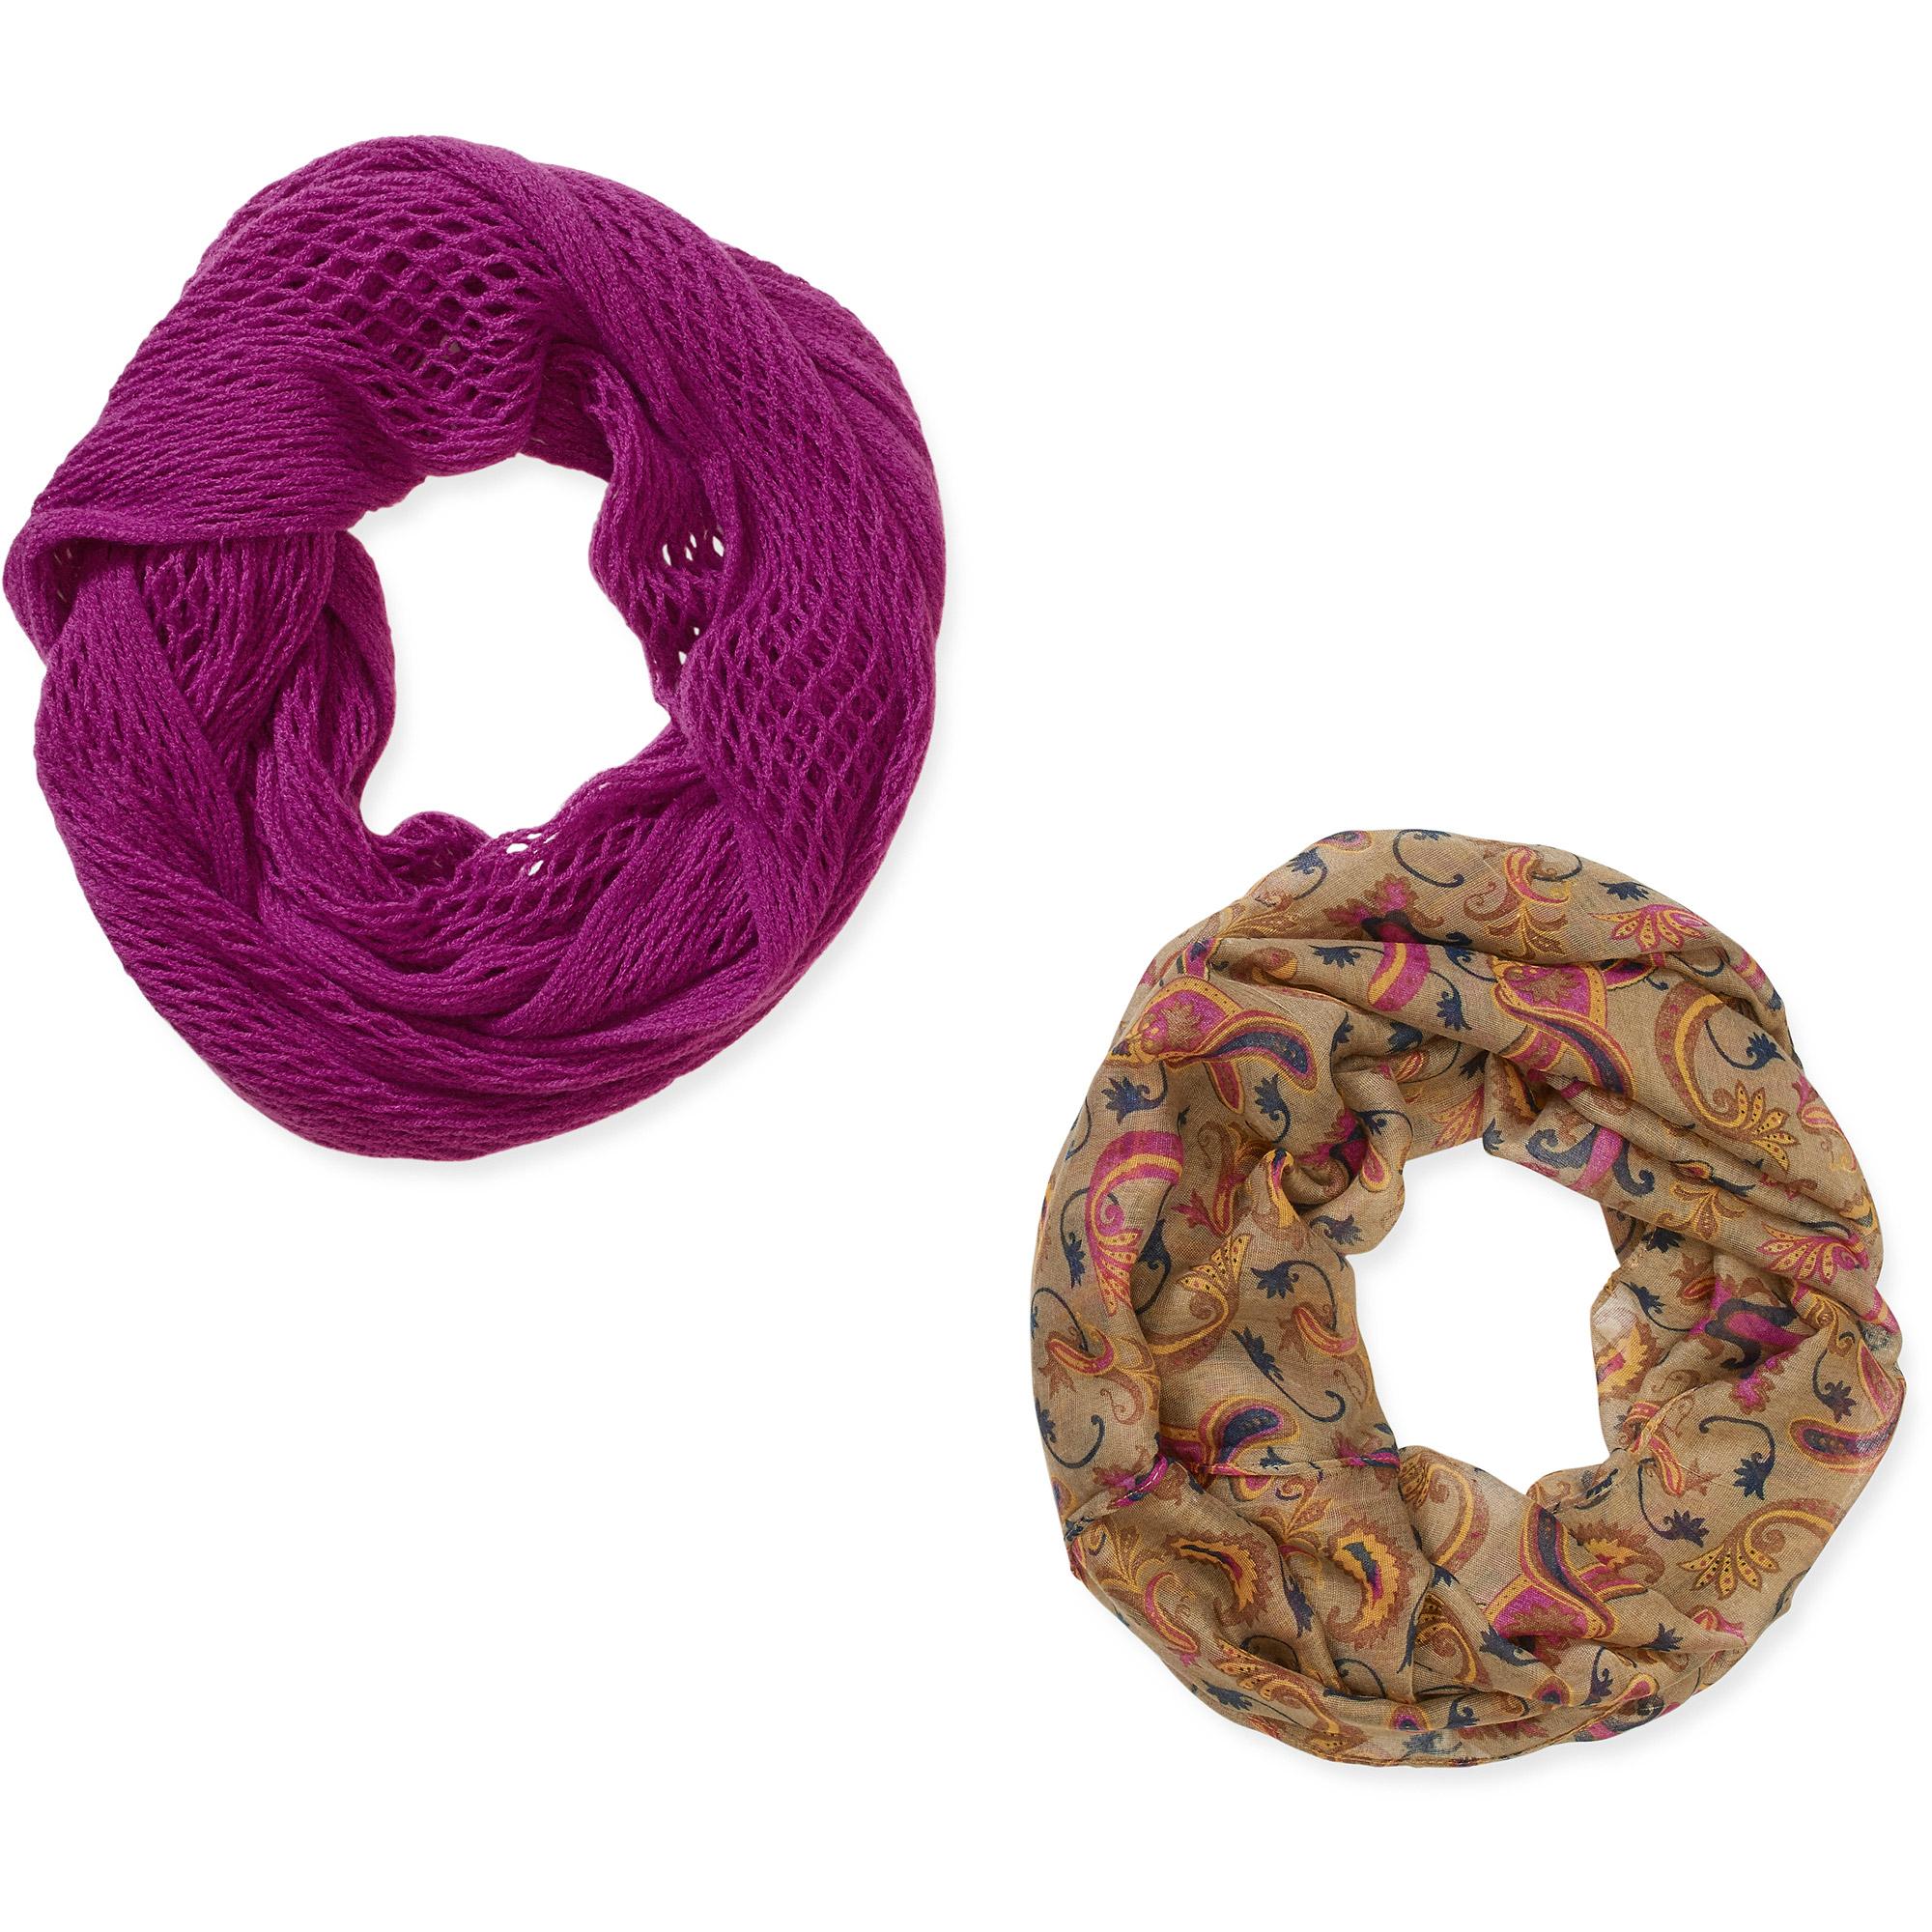 Women's Infinity Scarves 2 pack